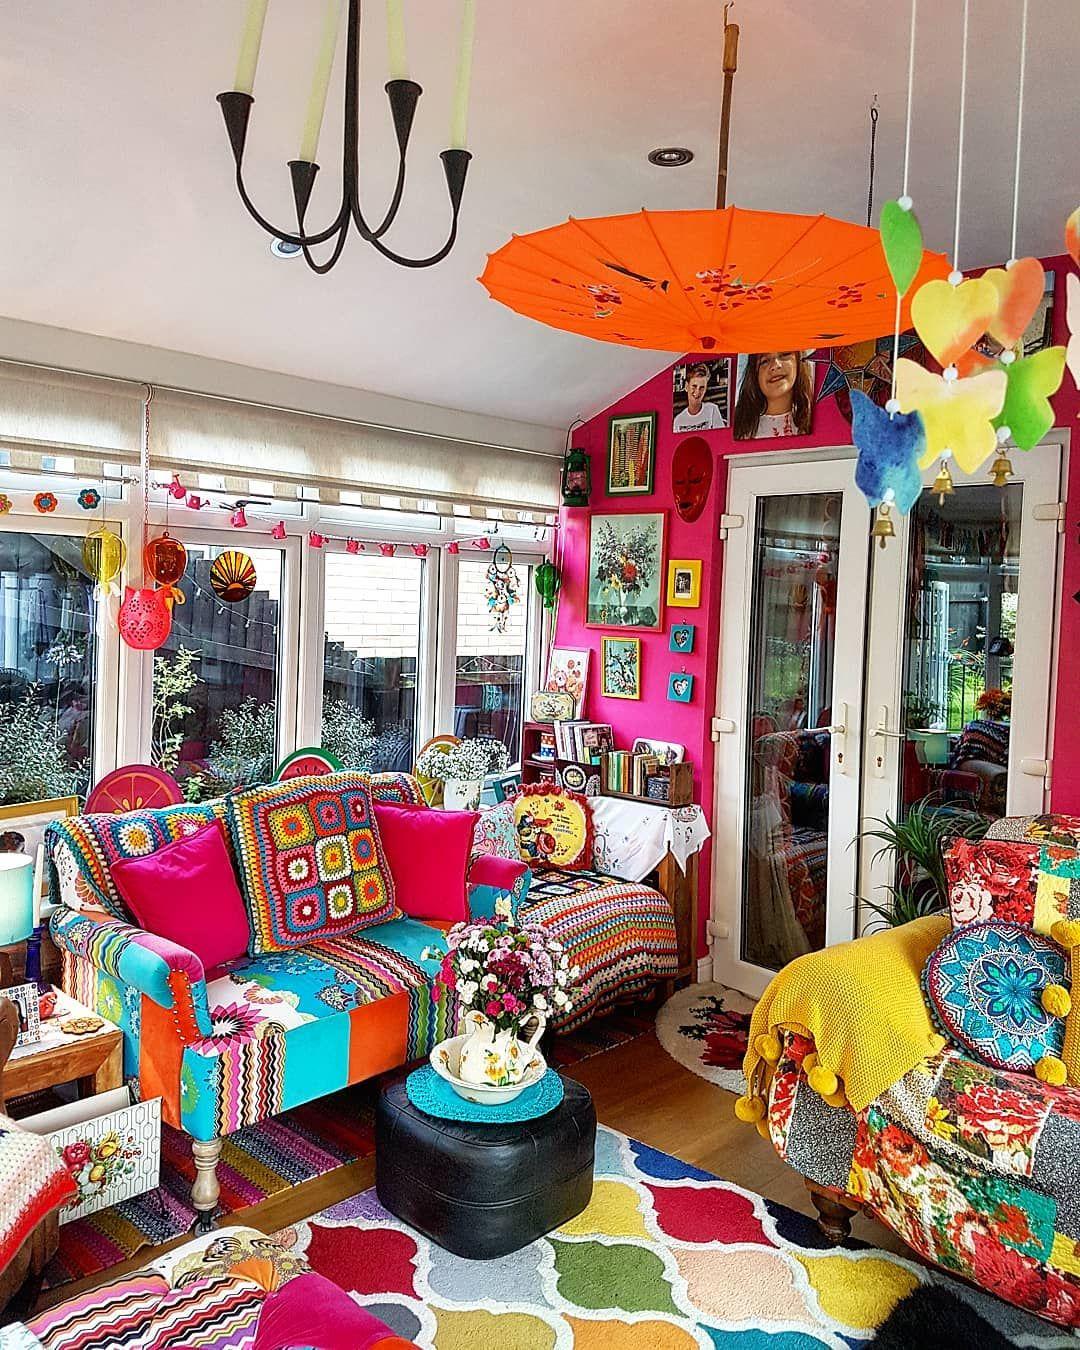 80 ideas for boho style furniture and decor boho style furniture colourful living room decor on boho chic decor living room bohemian kitchen id=71616